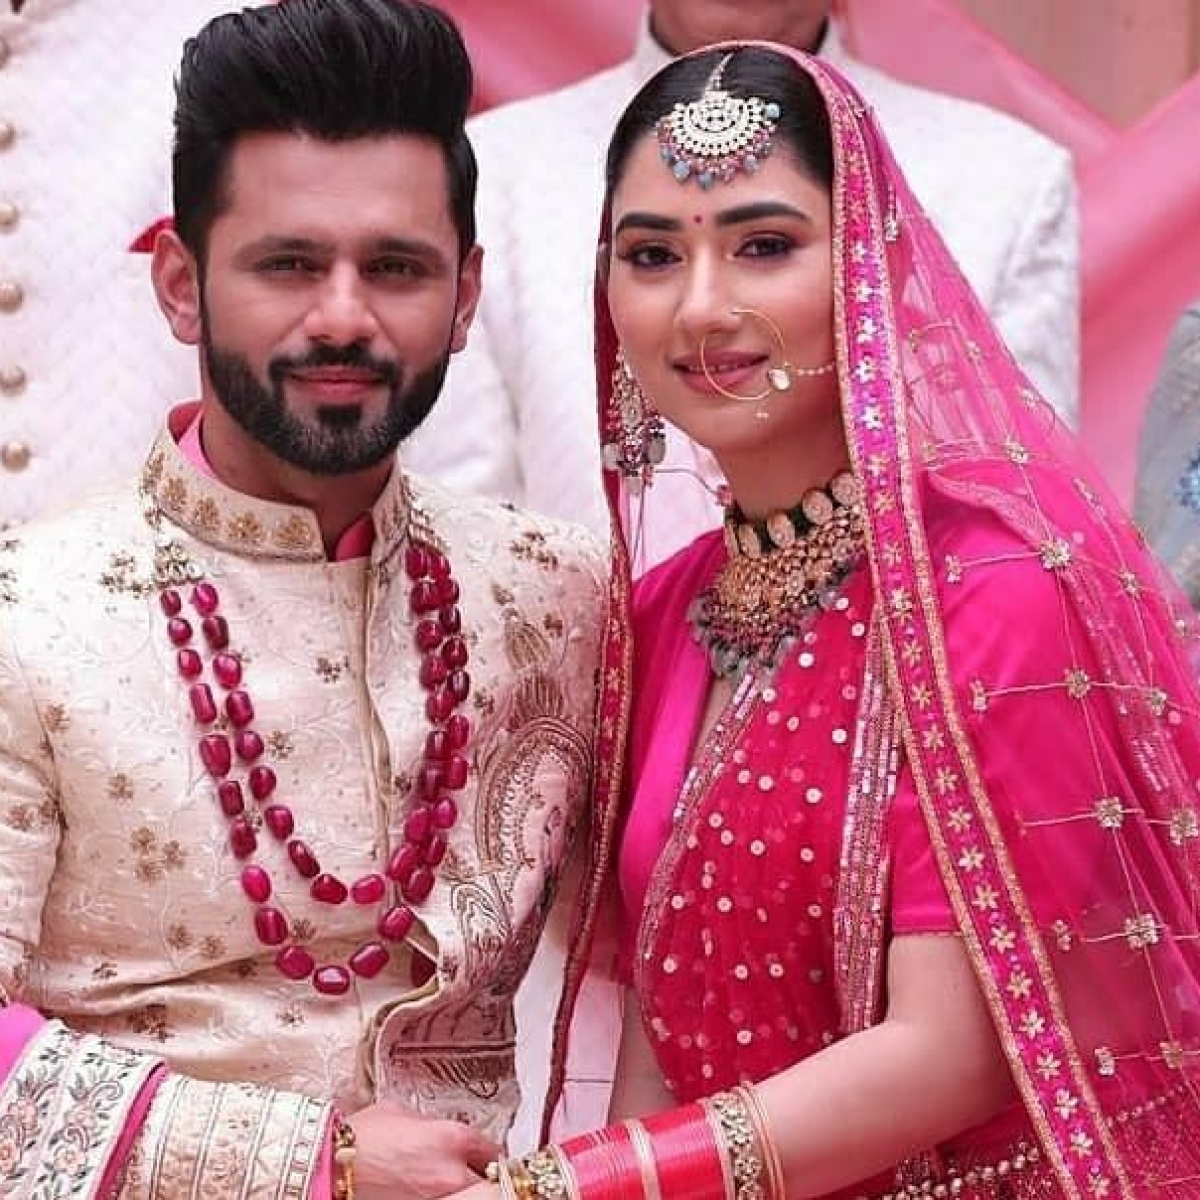 FPJ Fact Check: Did Rahul Vaidya and Disha Parmar really get married?